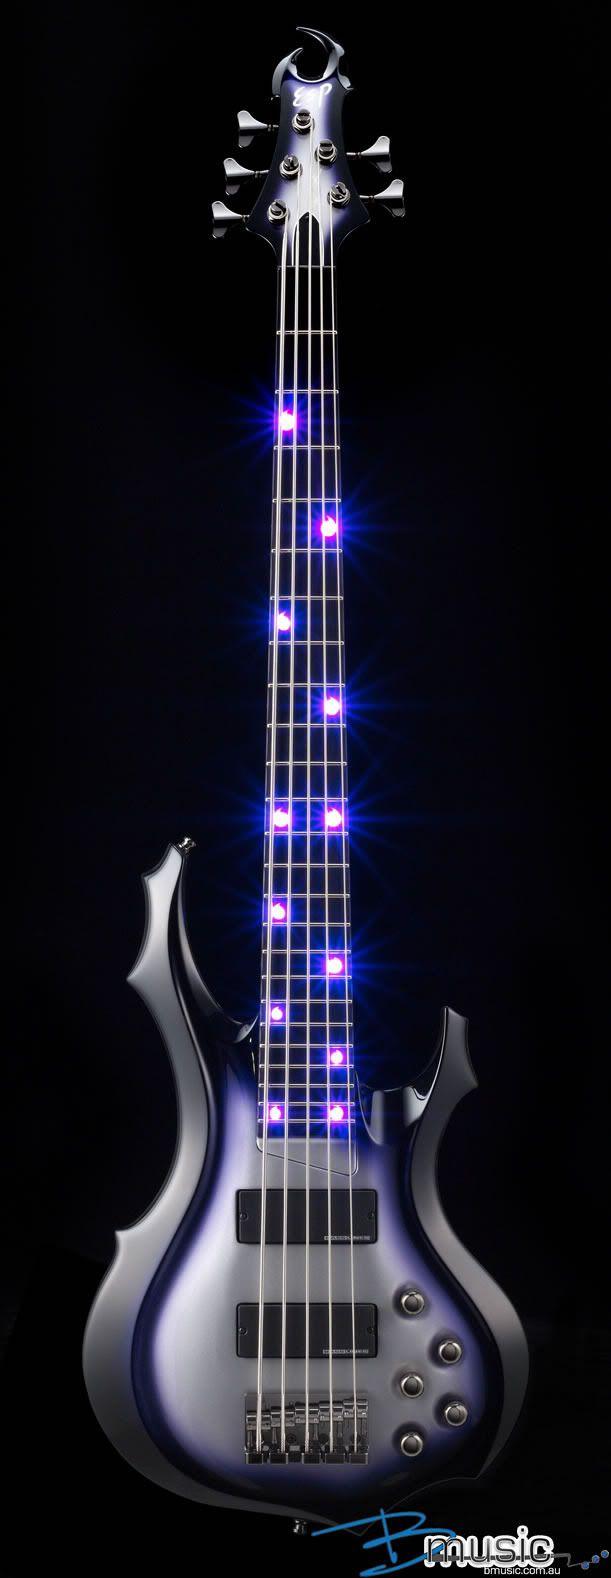 esp f 415 bass with purple led guitar pickin 39 pinterest. Black Bedroom Furniture Sets. Home Design Ideas